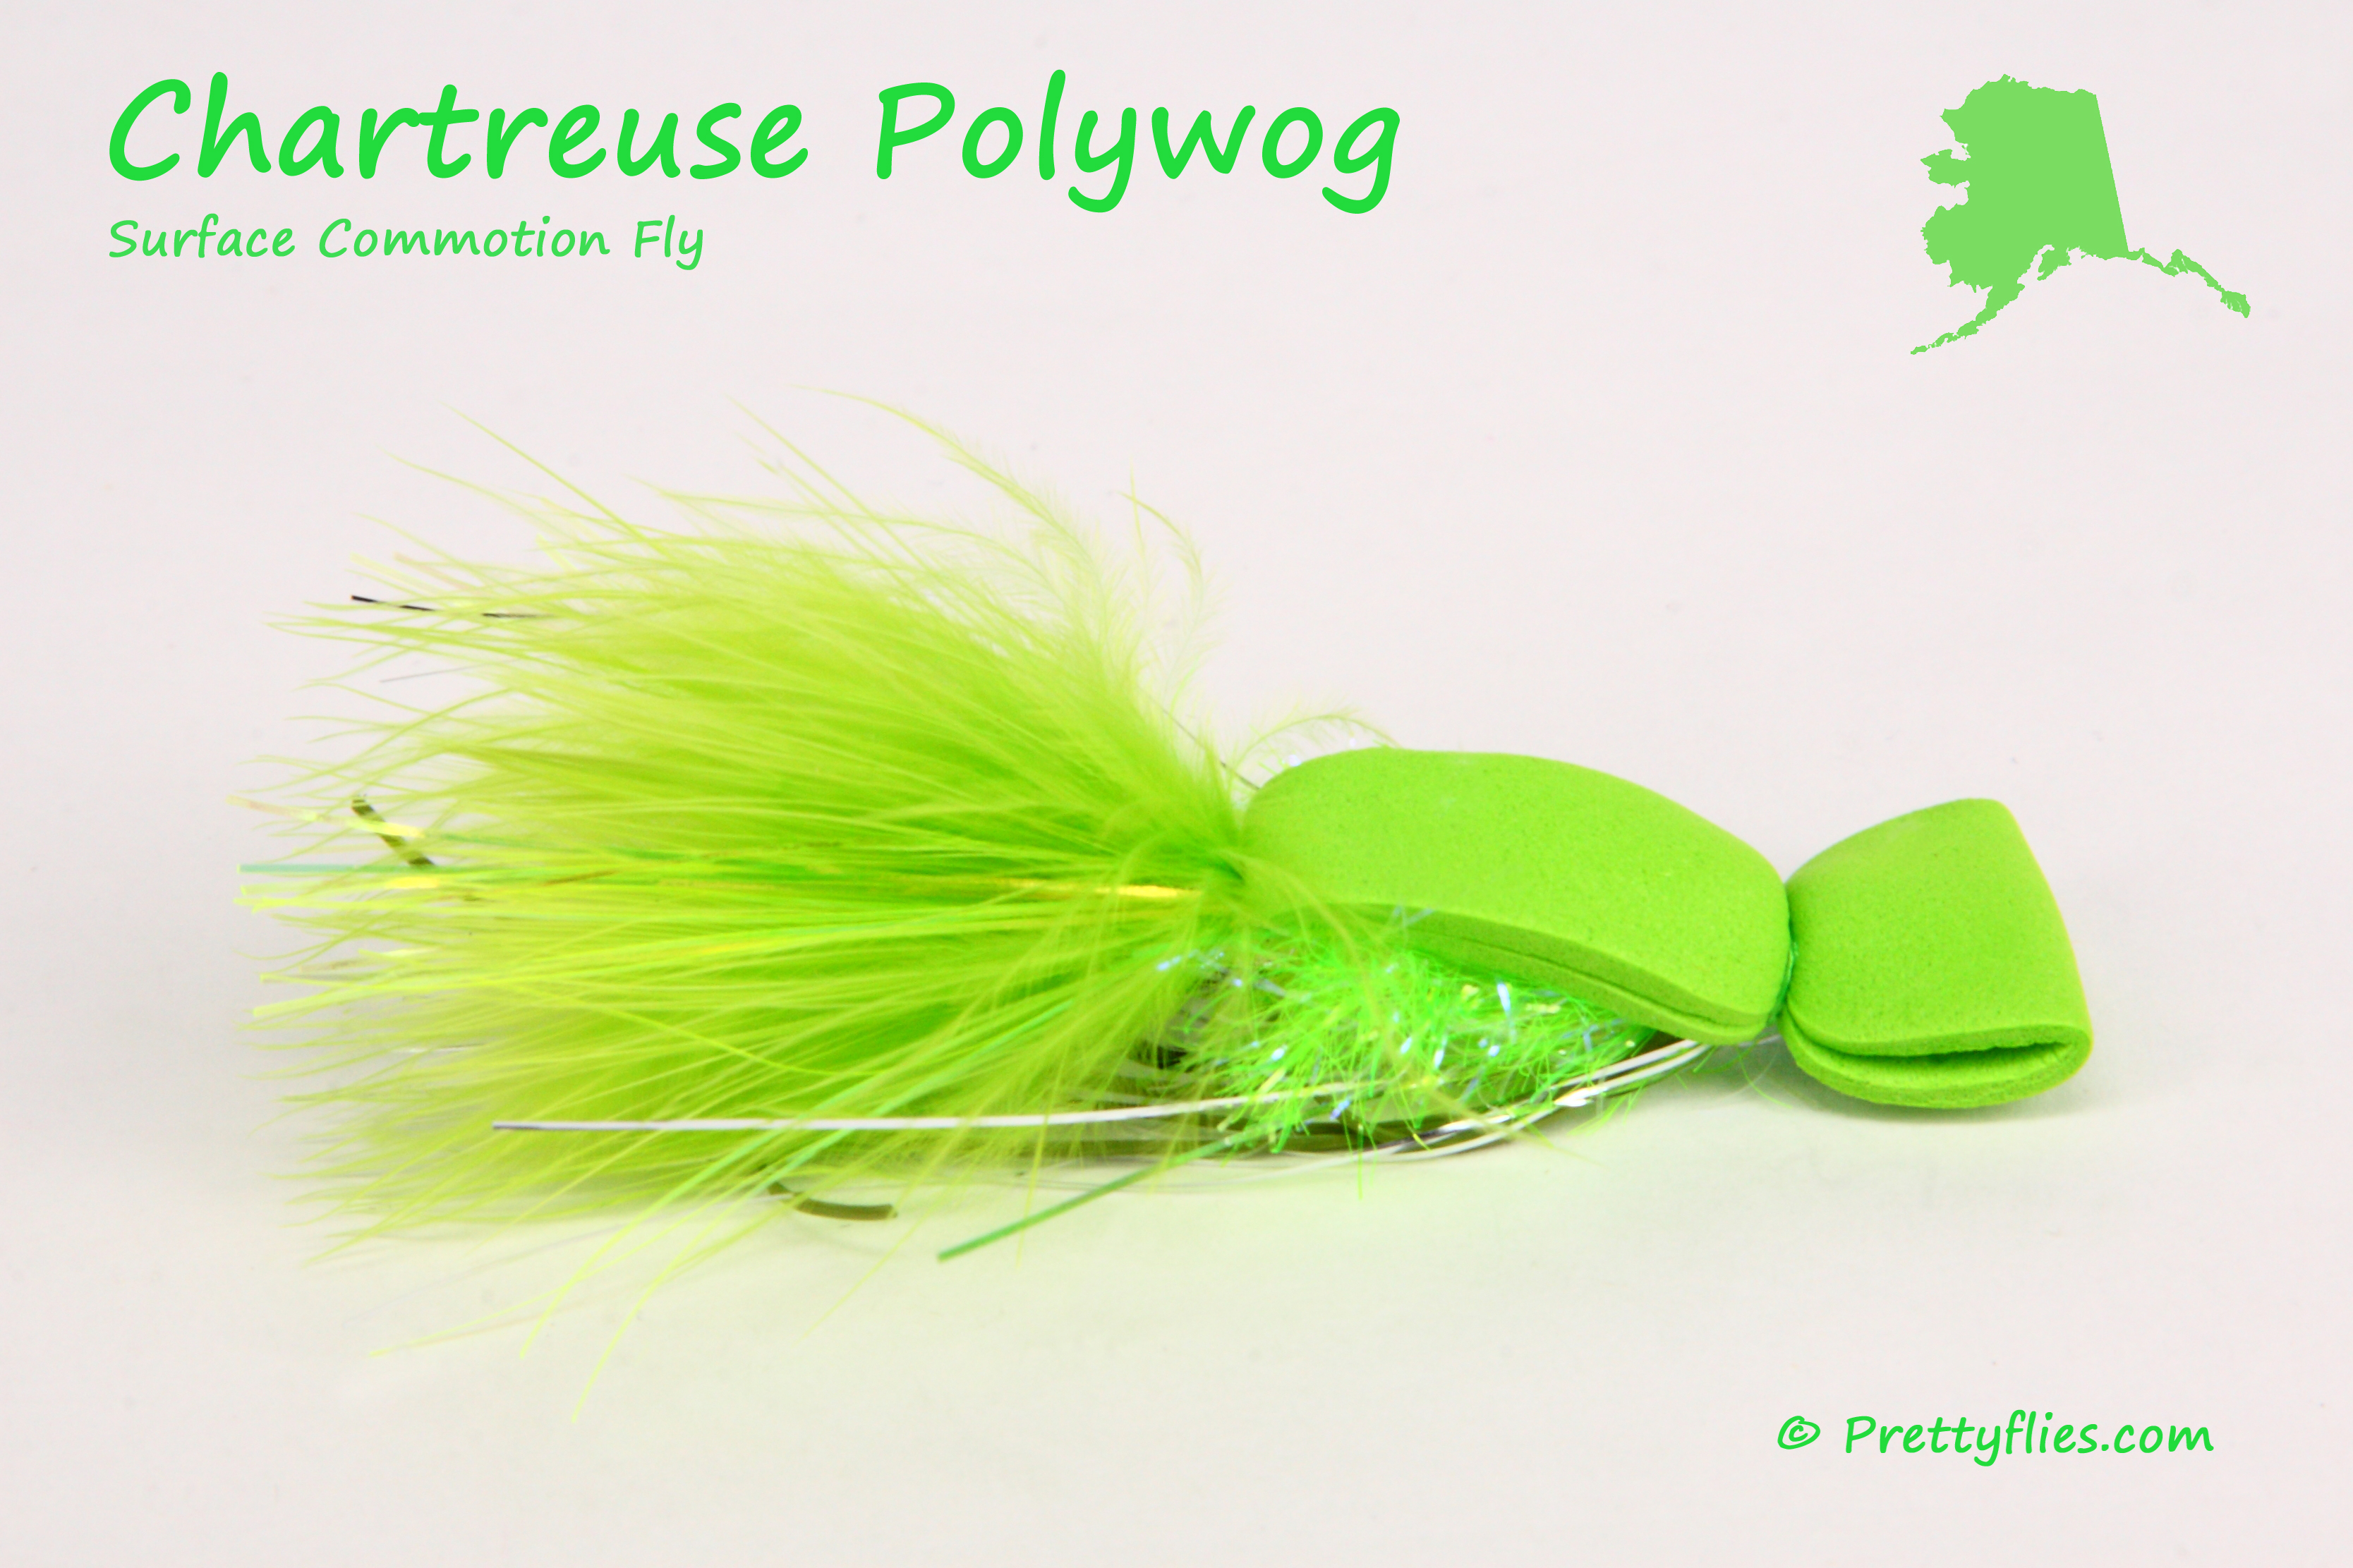 Chartreuse Polywog.jpg